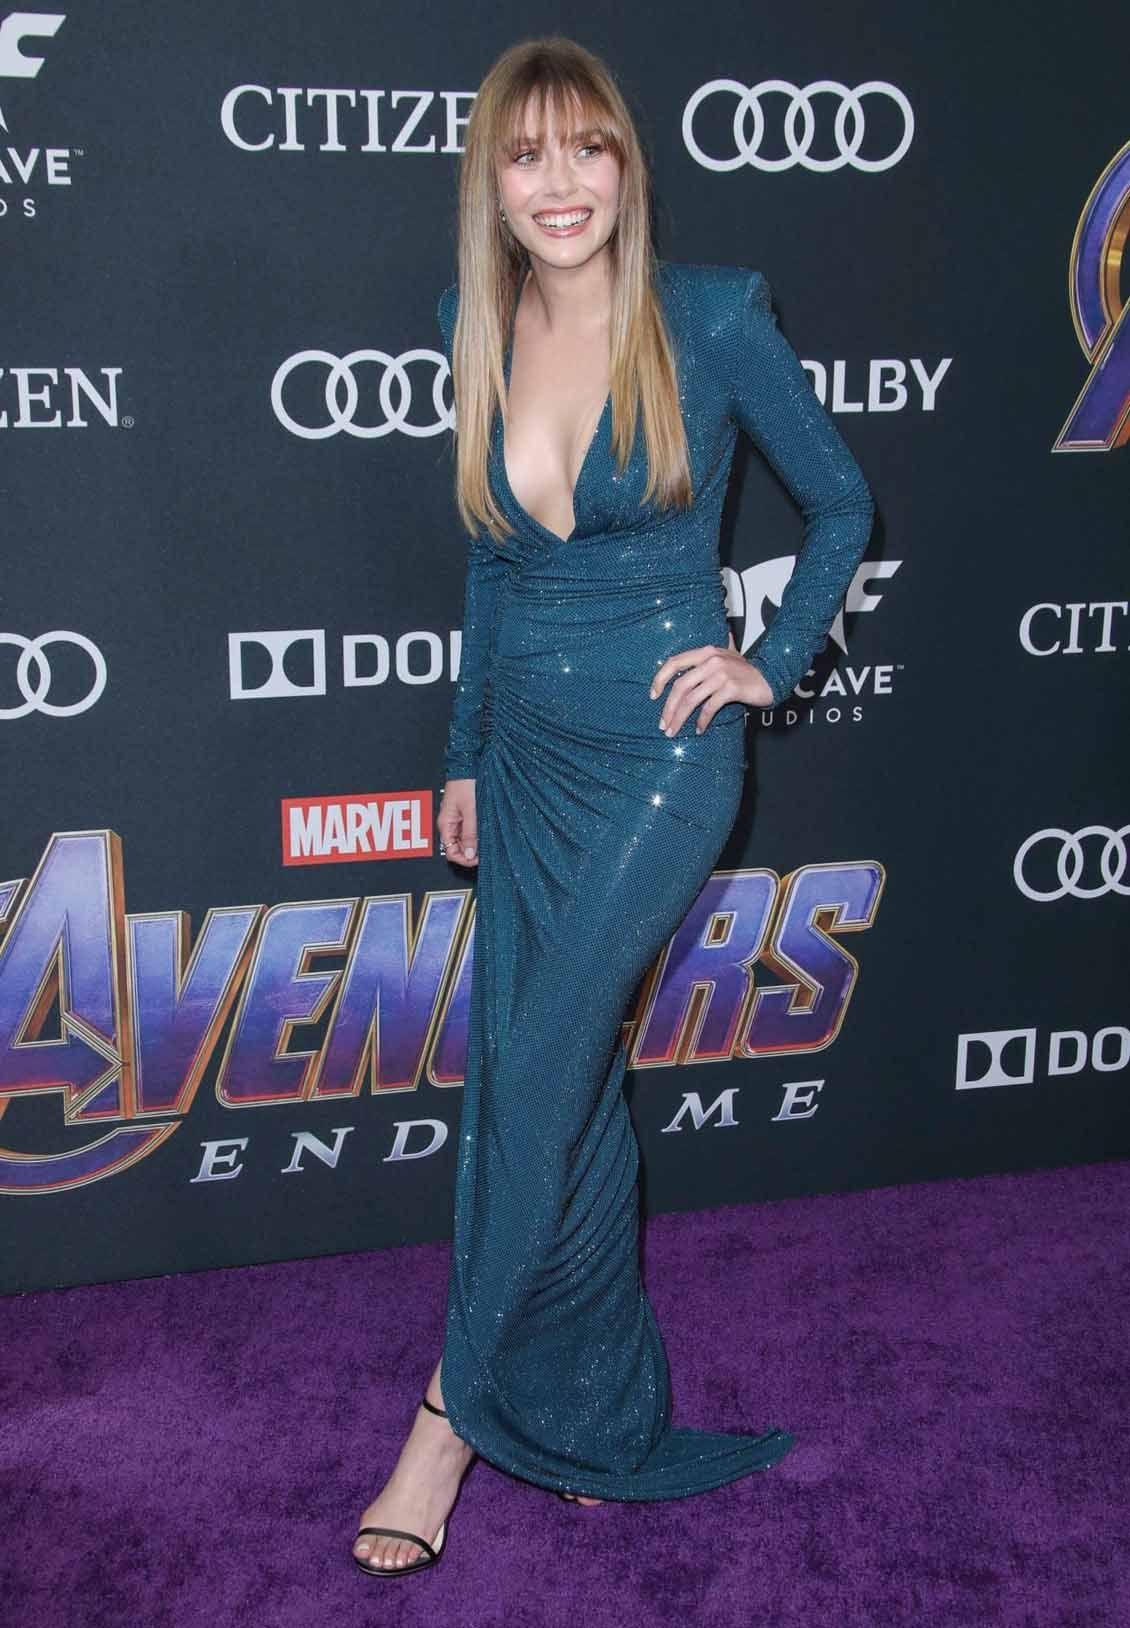 Elizabeth Olsen Attends Avengers Endgame Premiere Los Angeles Celebvegas Elizabeth Olsen Elizabeth Olsen Scarlet Witch Olsen